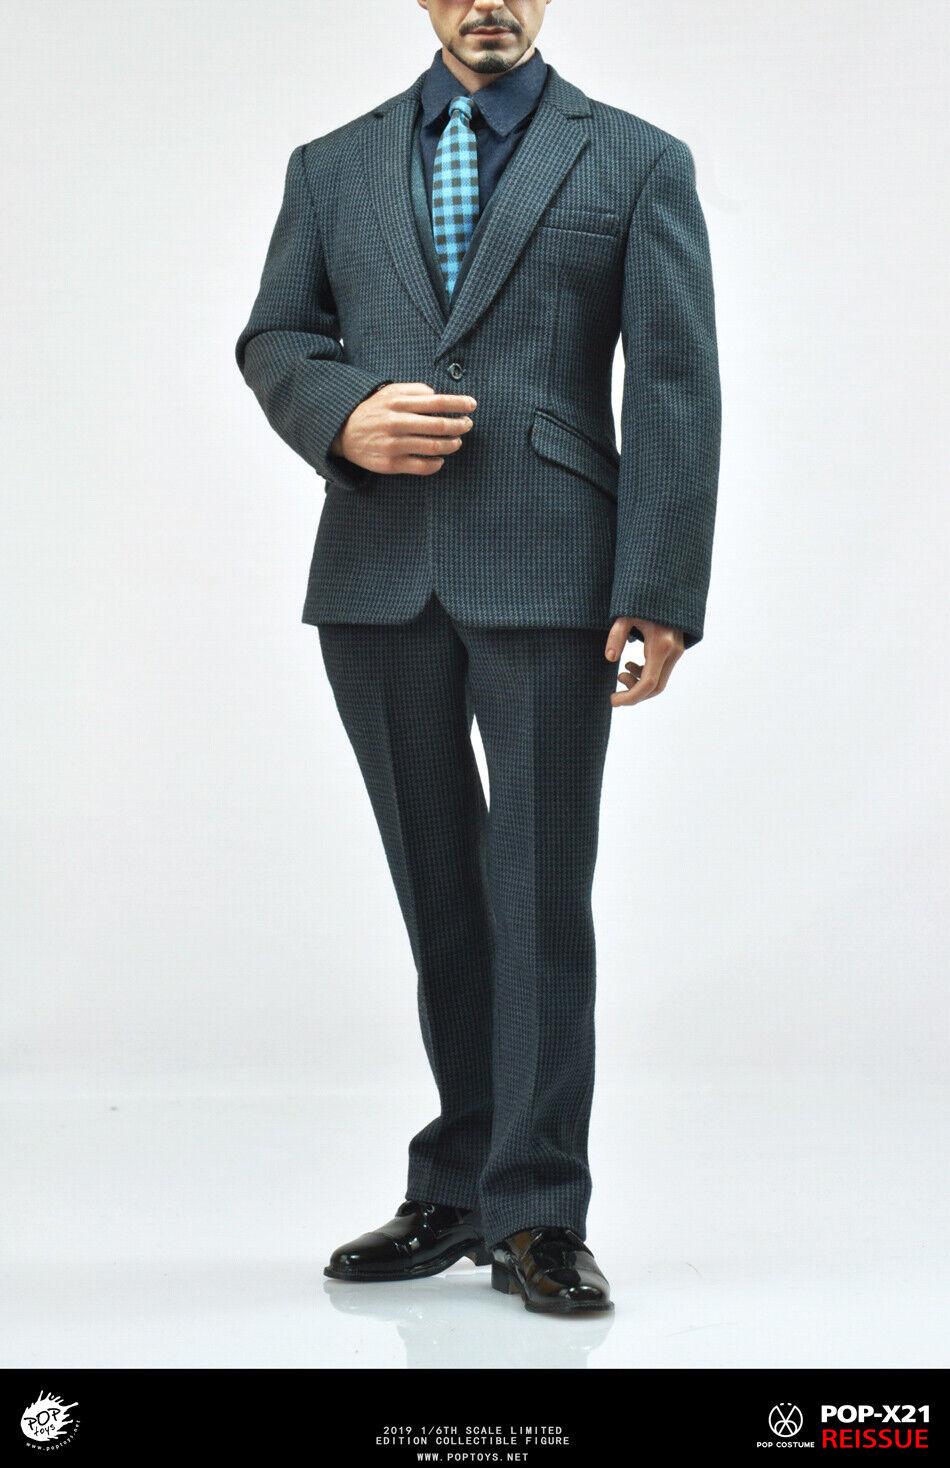 POPTOYS X21 1 6 Tony Stark Business Suit Male Clothes Model F 12'' Action Figure